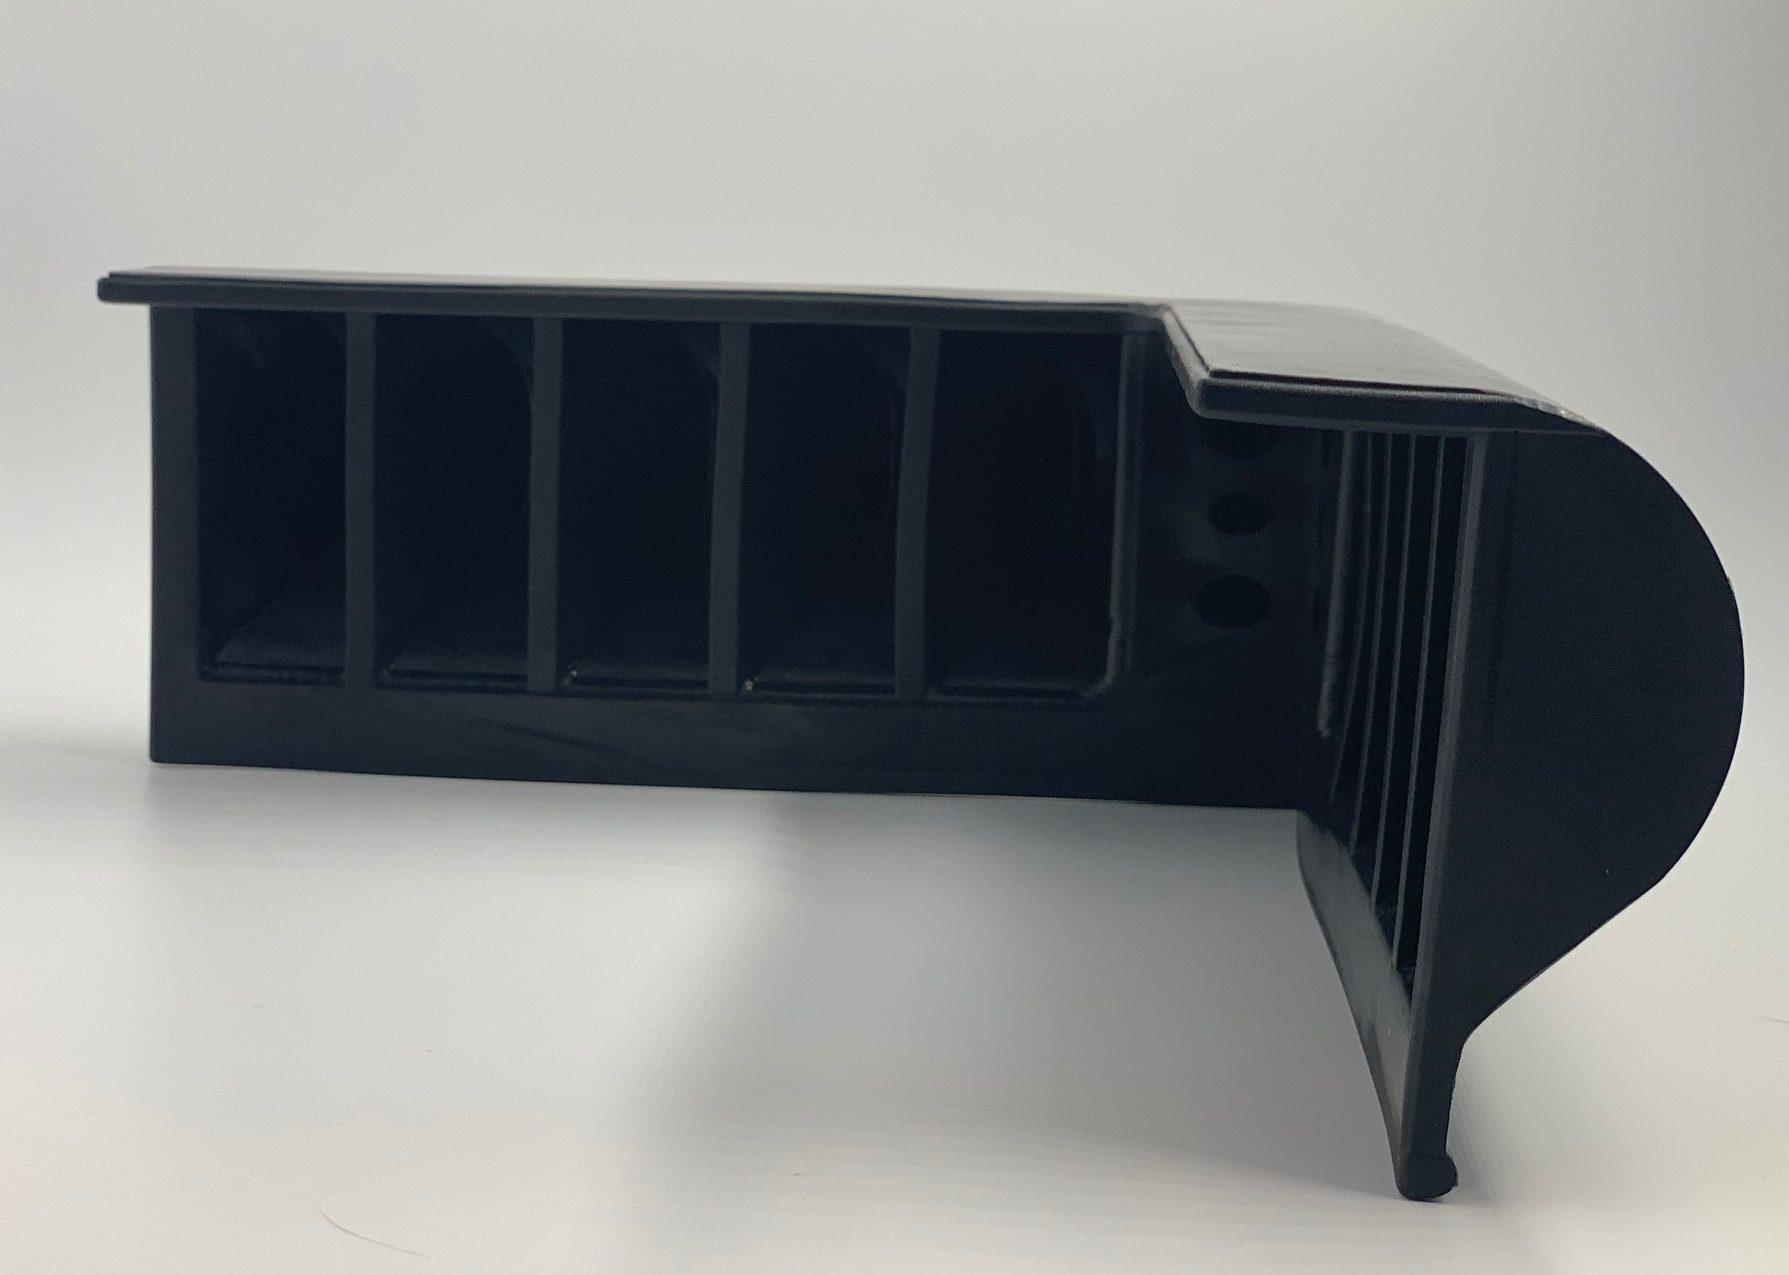 Black Dock Bumper Corner PVC Vinyl Marine